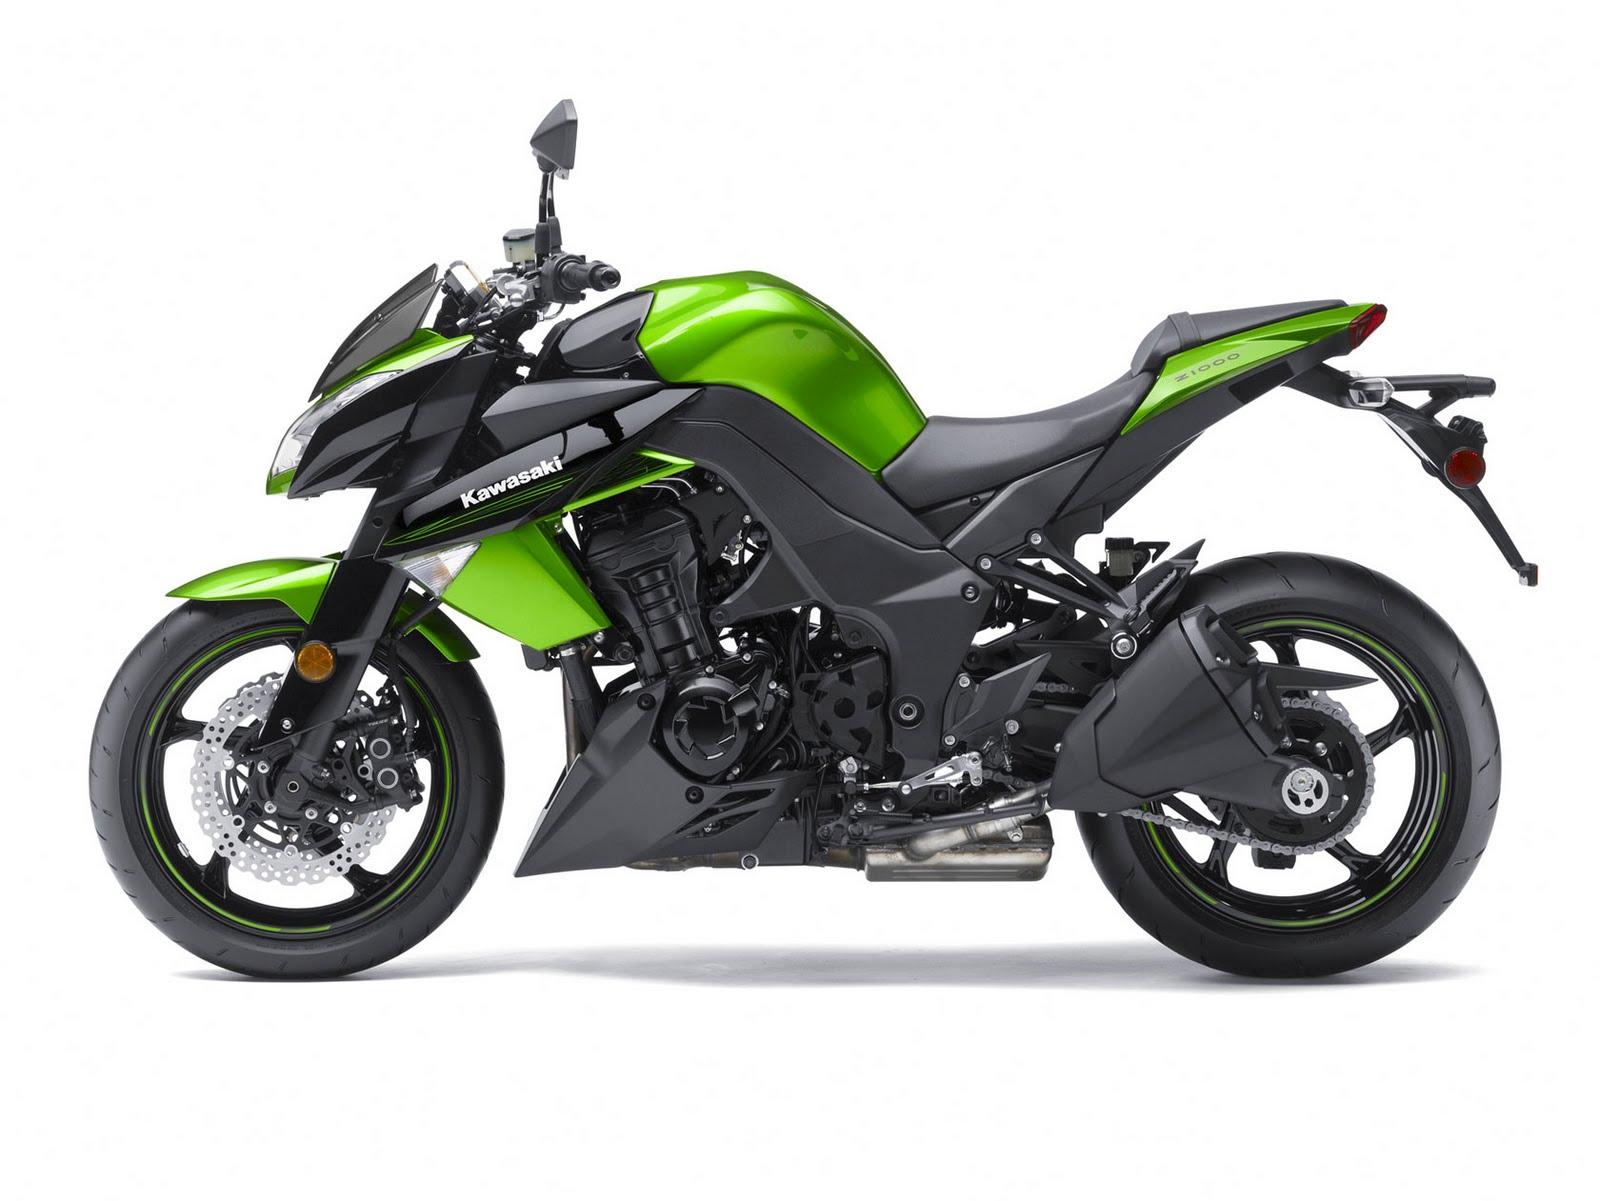 top motorcycle wallpapers 2011 kawasaki z1000 sportbike. Black Bedroom Furniture Sets. Home Design Ideas